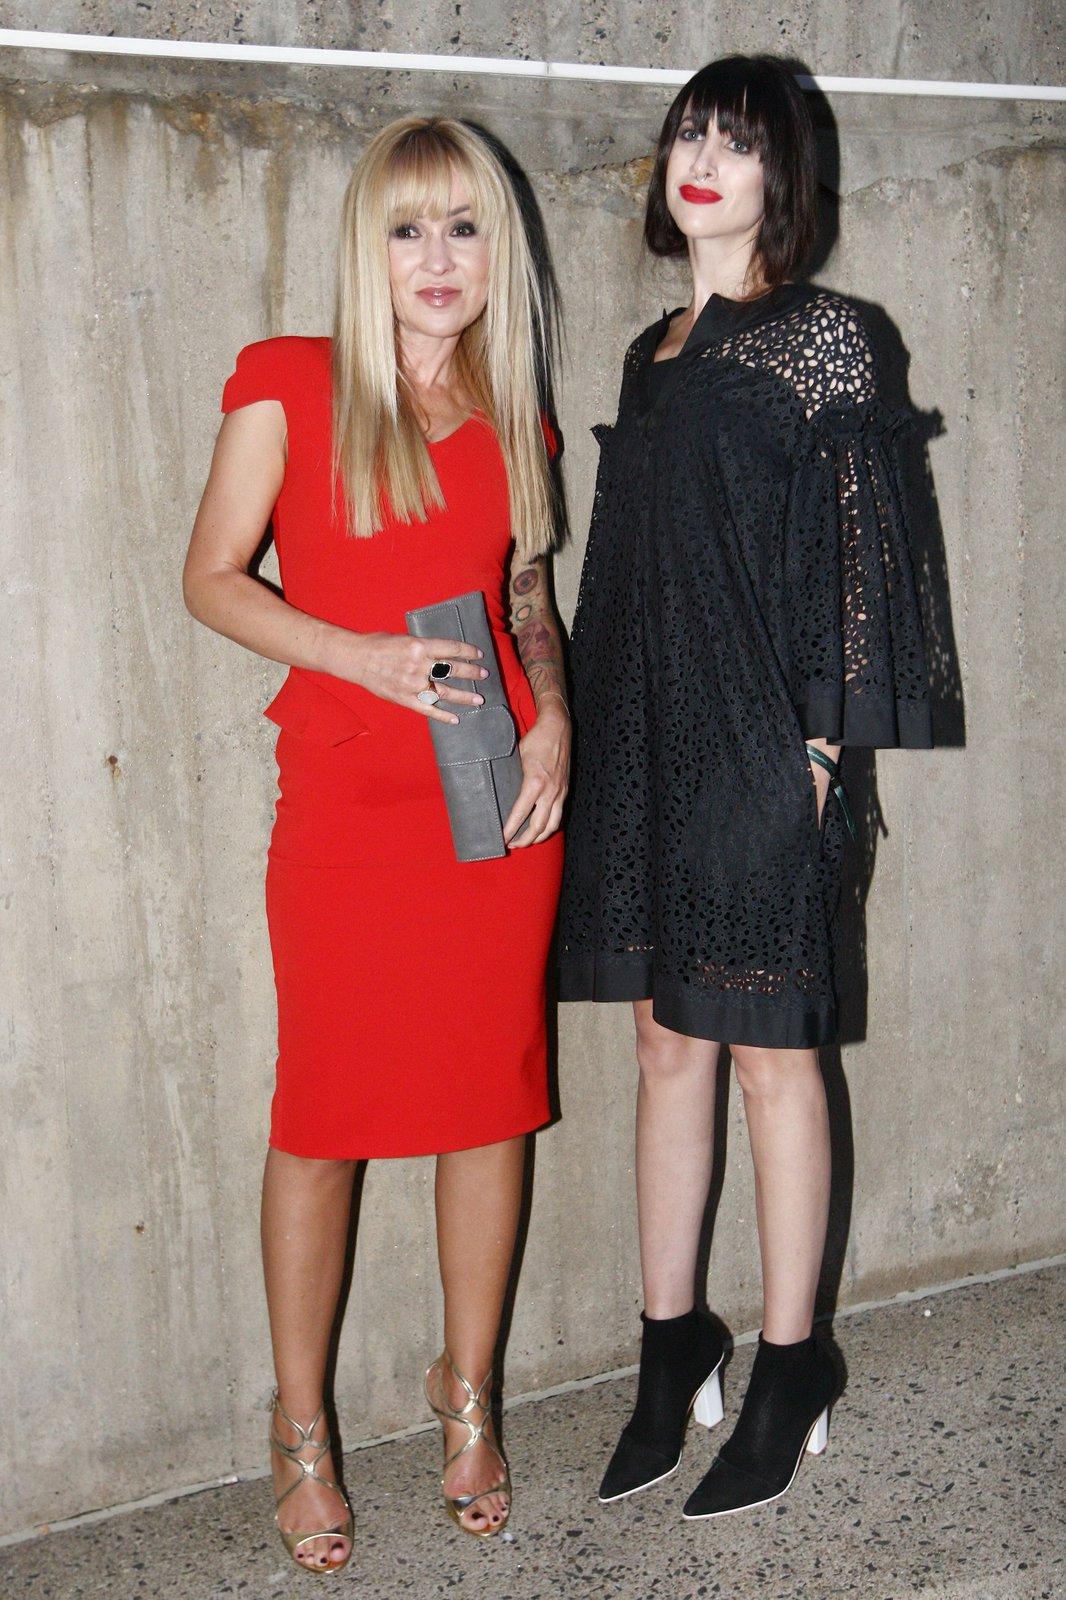 Kaira Hrachovcová a Ina Tina: Stylová dvojhra vyšší dívčí